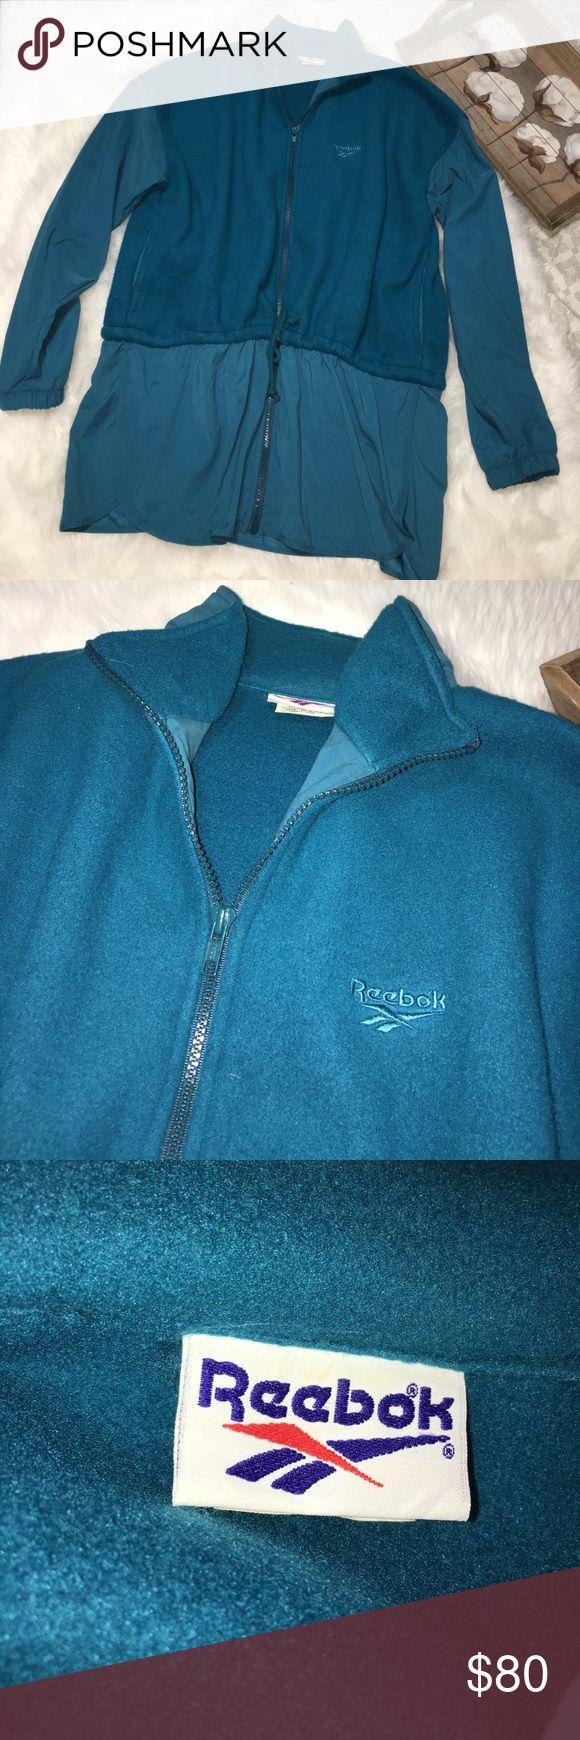 Vintage Reebok Teal Blue Fleece Jacket Sz L Super chic vintage Reebok size large Teal blue zip up fleece jacket in excellent gently used condition. Reebok Jackets & Coats